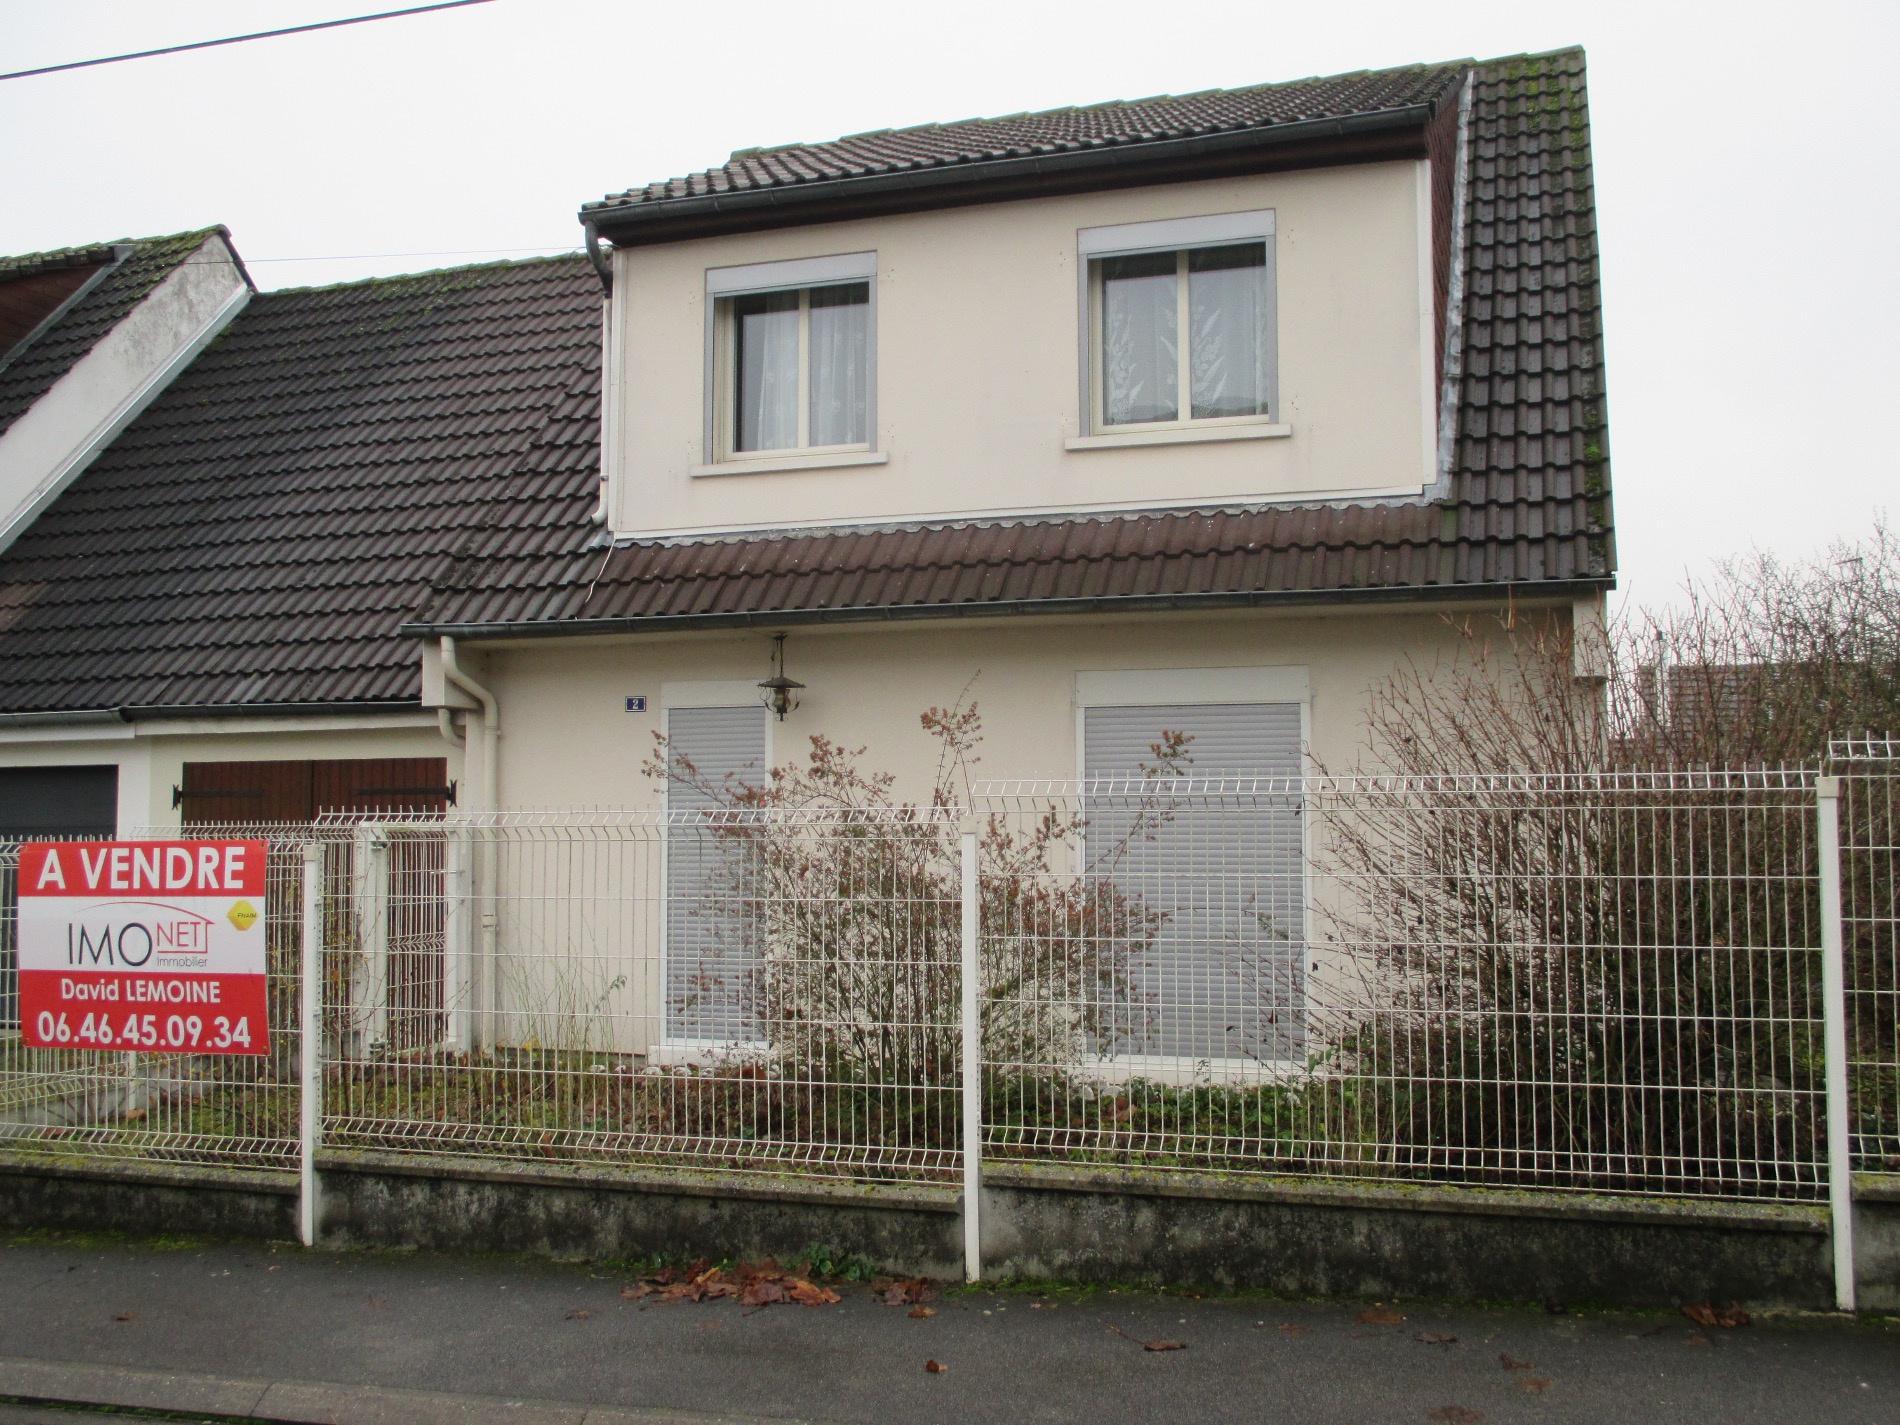 Imonet immobilier bussy st georges et environs for Le pavillon de bailly